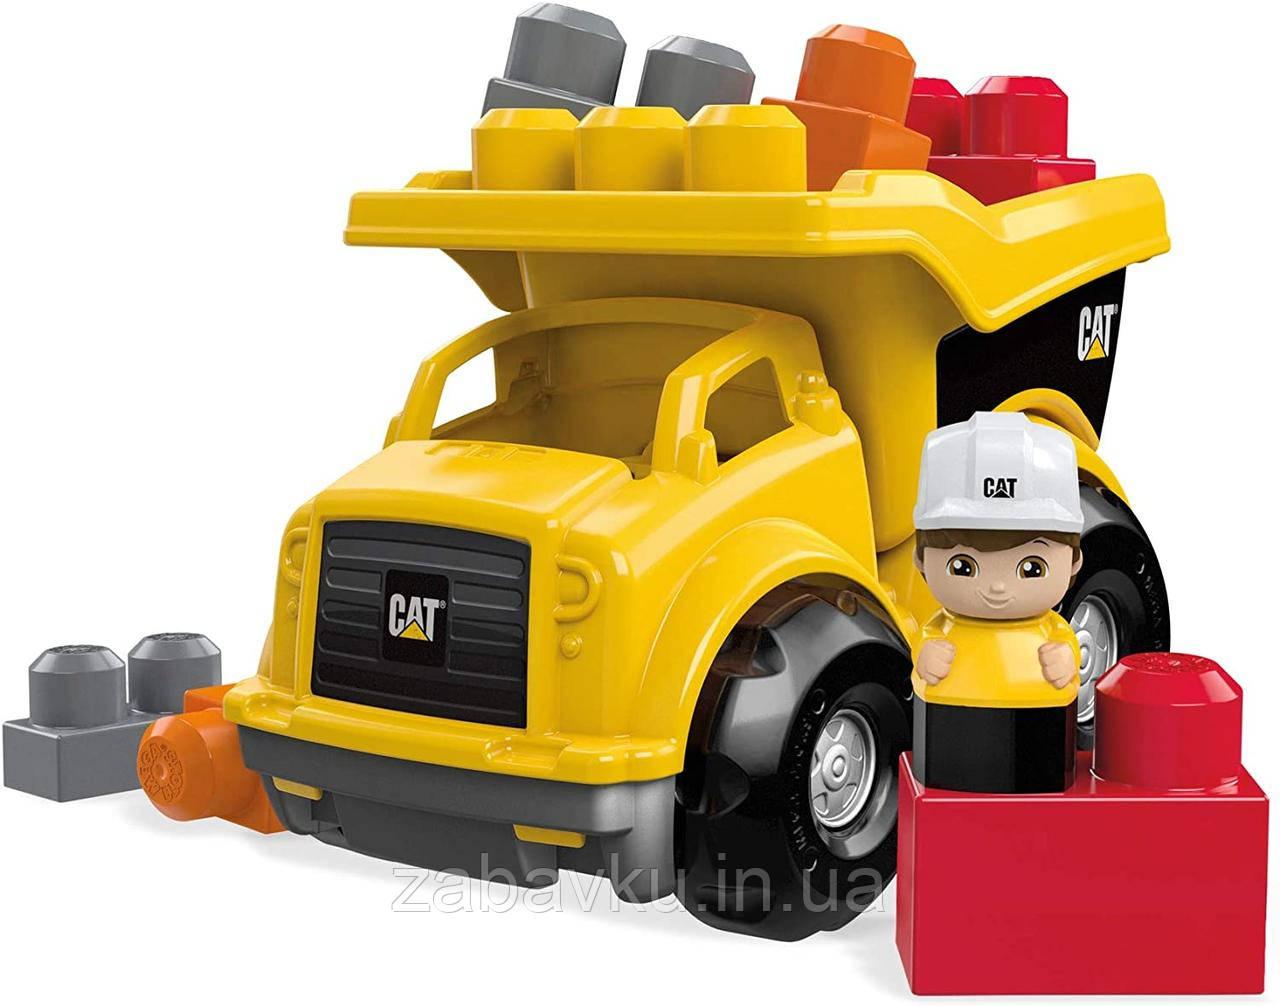 Грузовик Мега Блокс Mega Bloks Cat Lil´ Dump Truck Строительная техника Catepillar